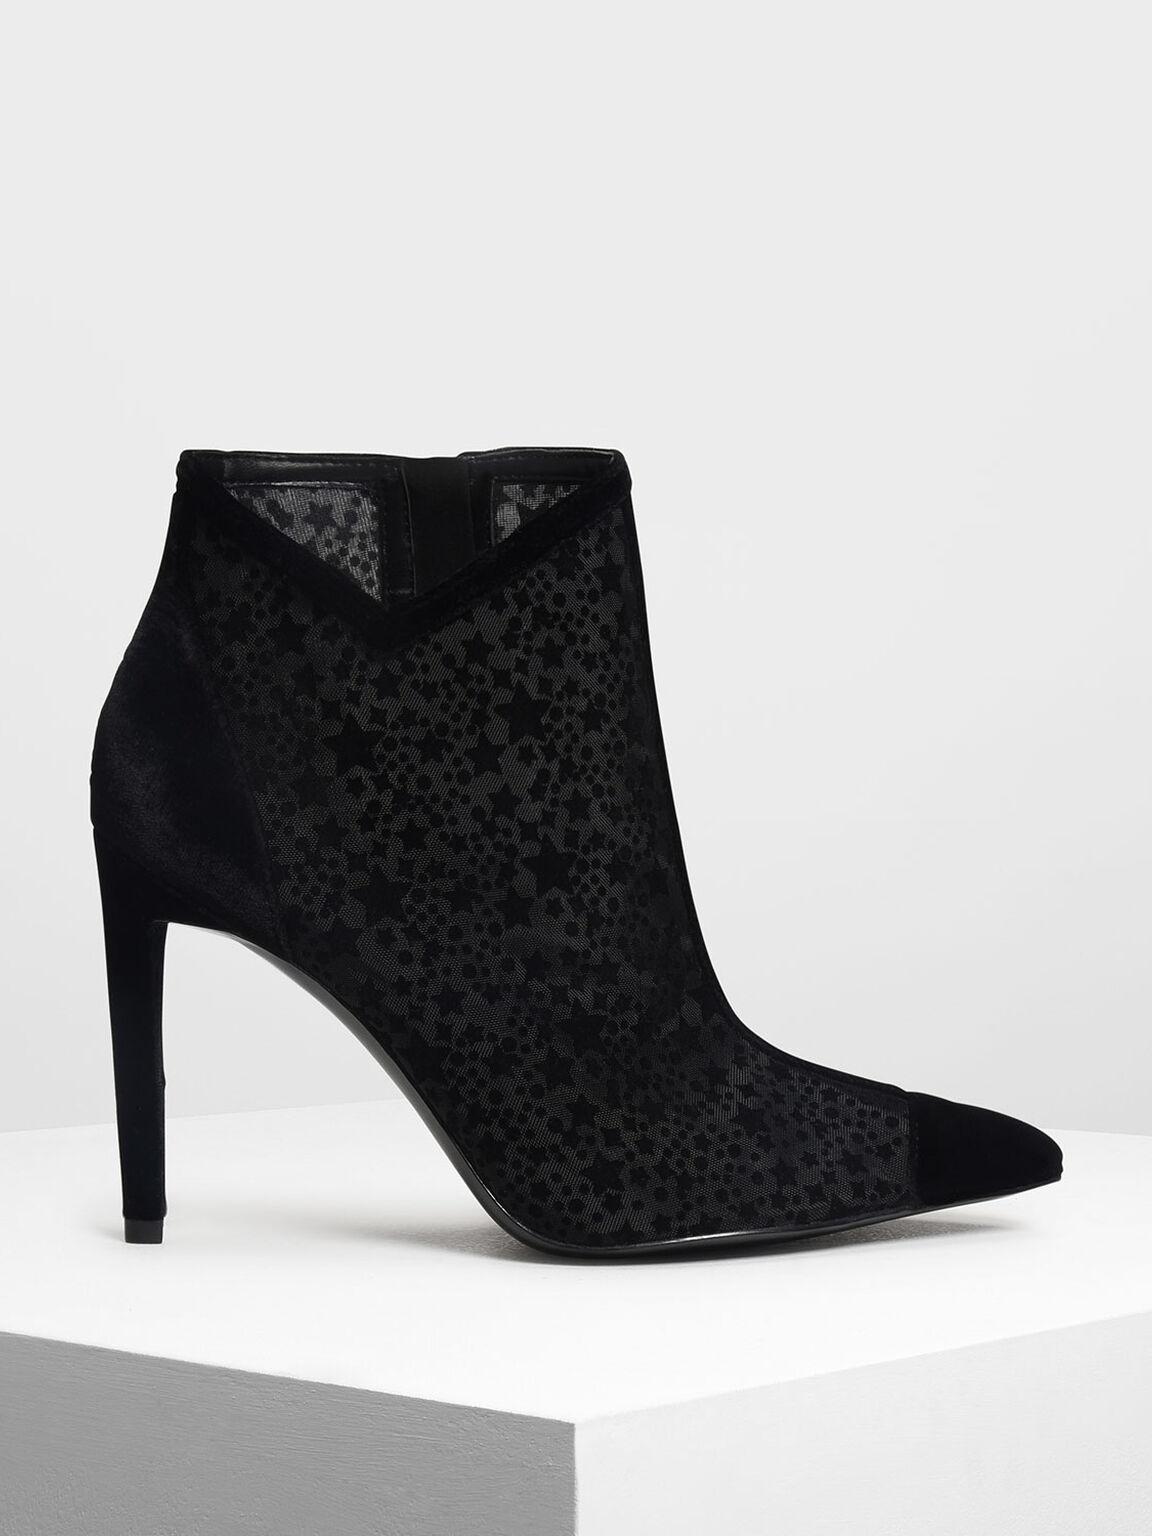 Velvet Flocking Ankle Boots, Black, hi-res